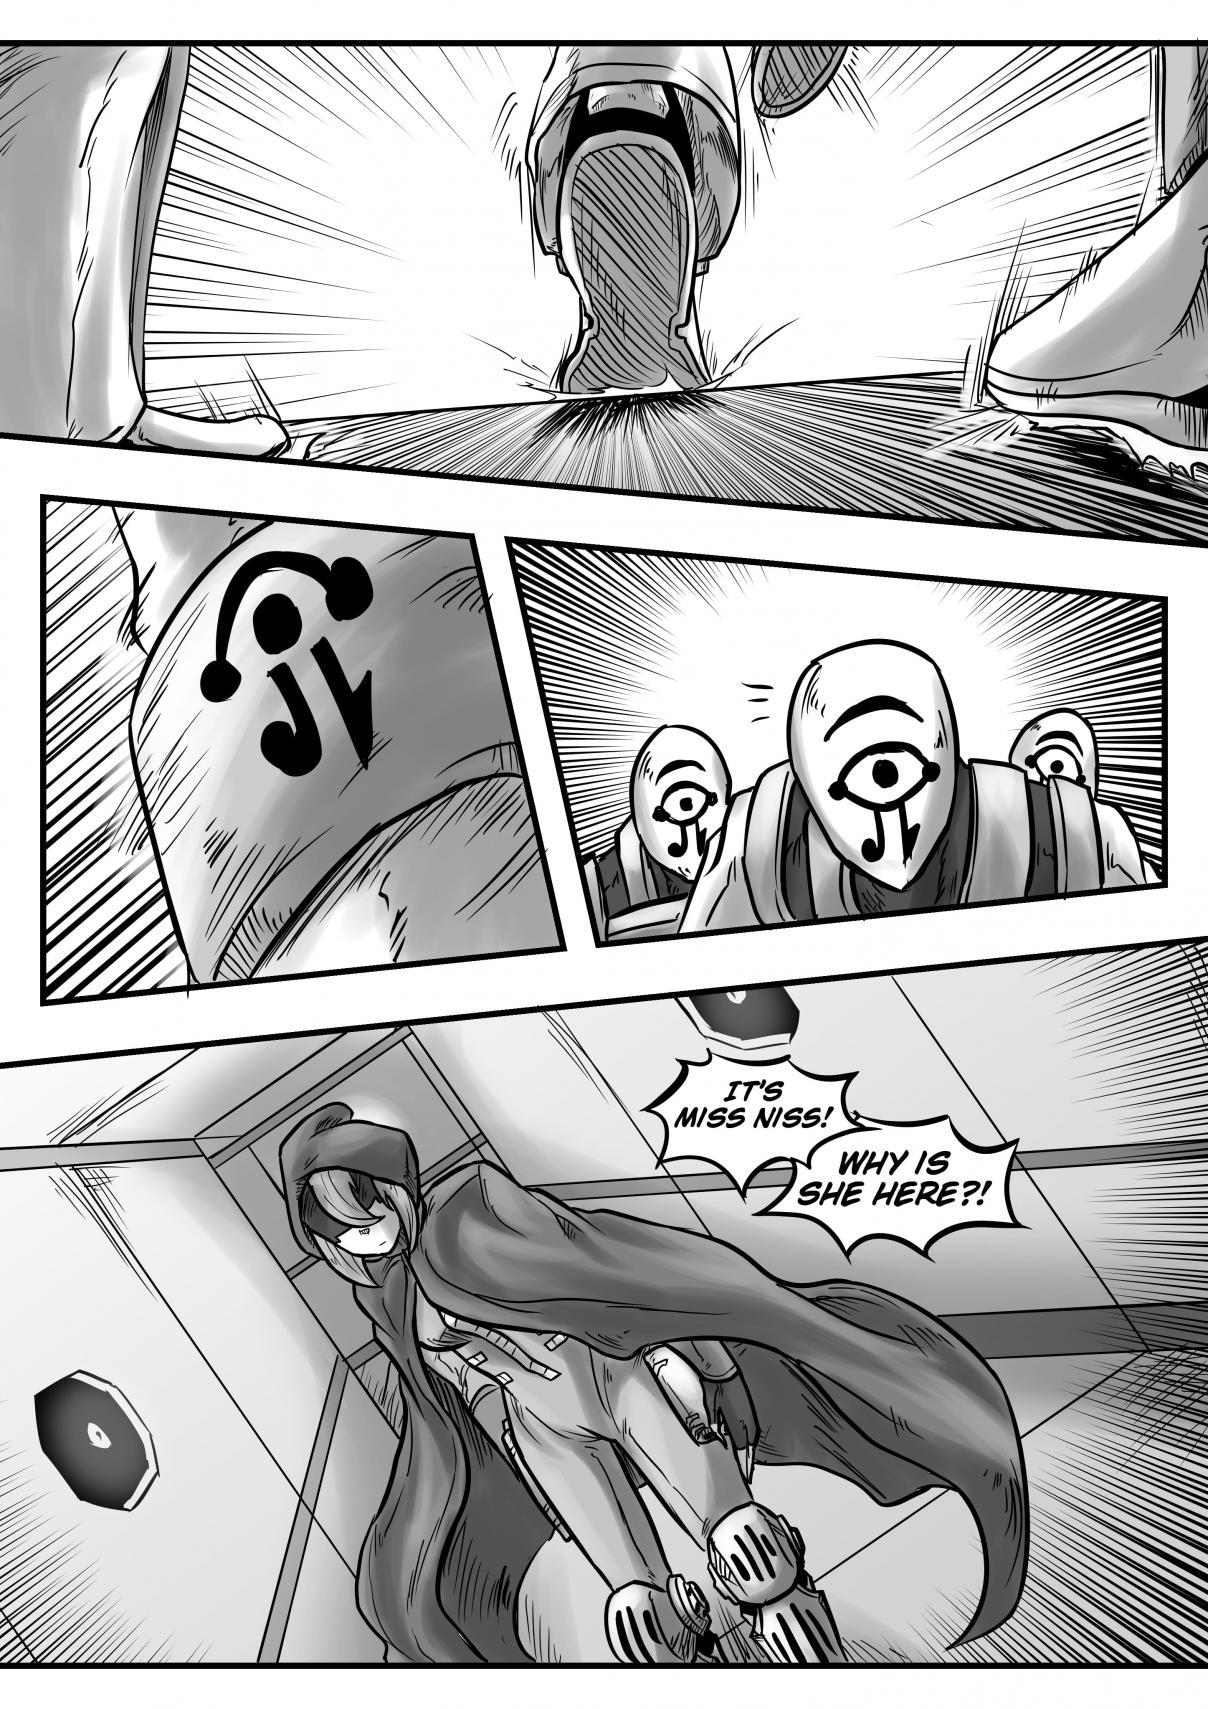 https://img3.nineanime.com/comics/pic4/45/38125/2761202/a7319a1732f803bece8314911dd6f52b.jpg Page 1